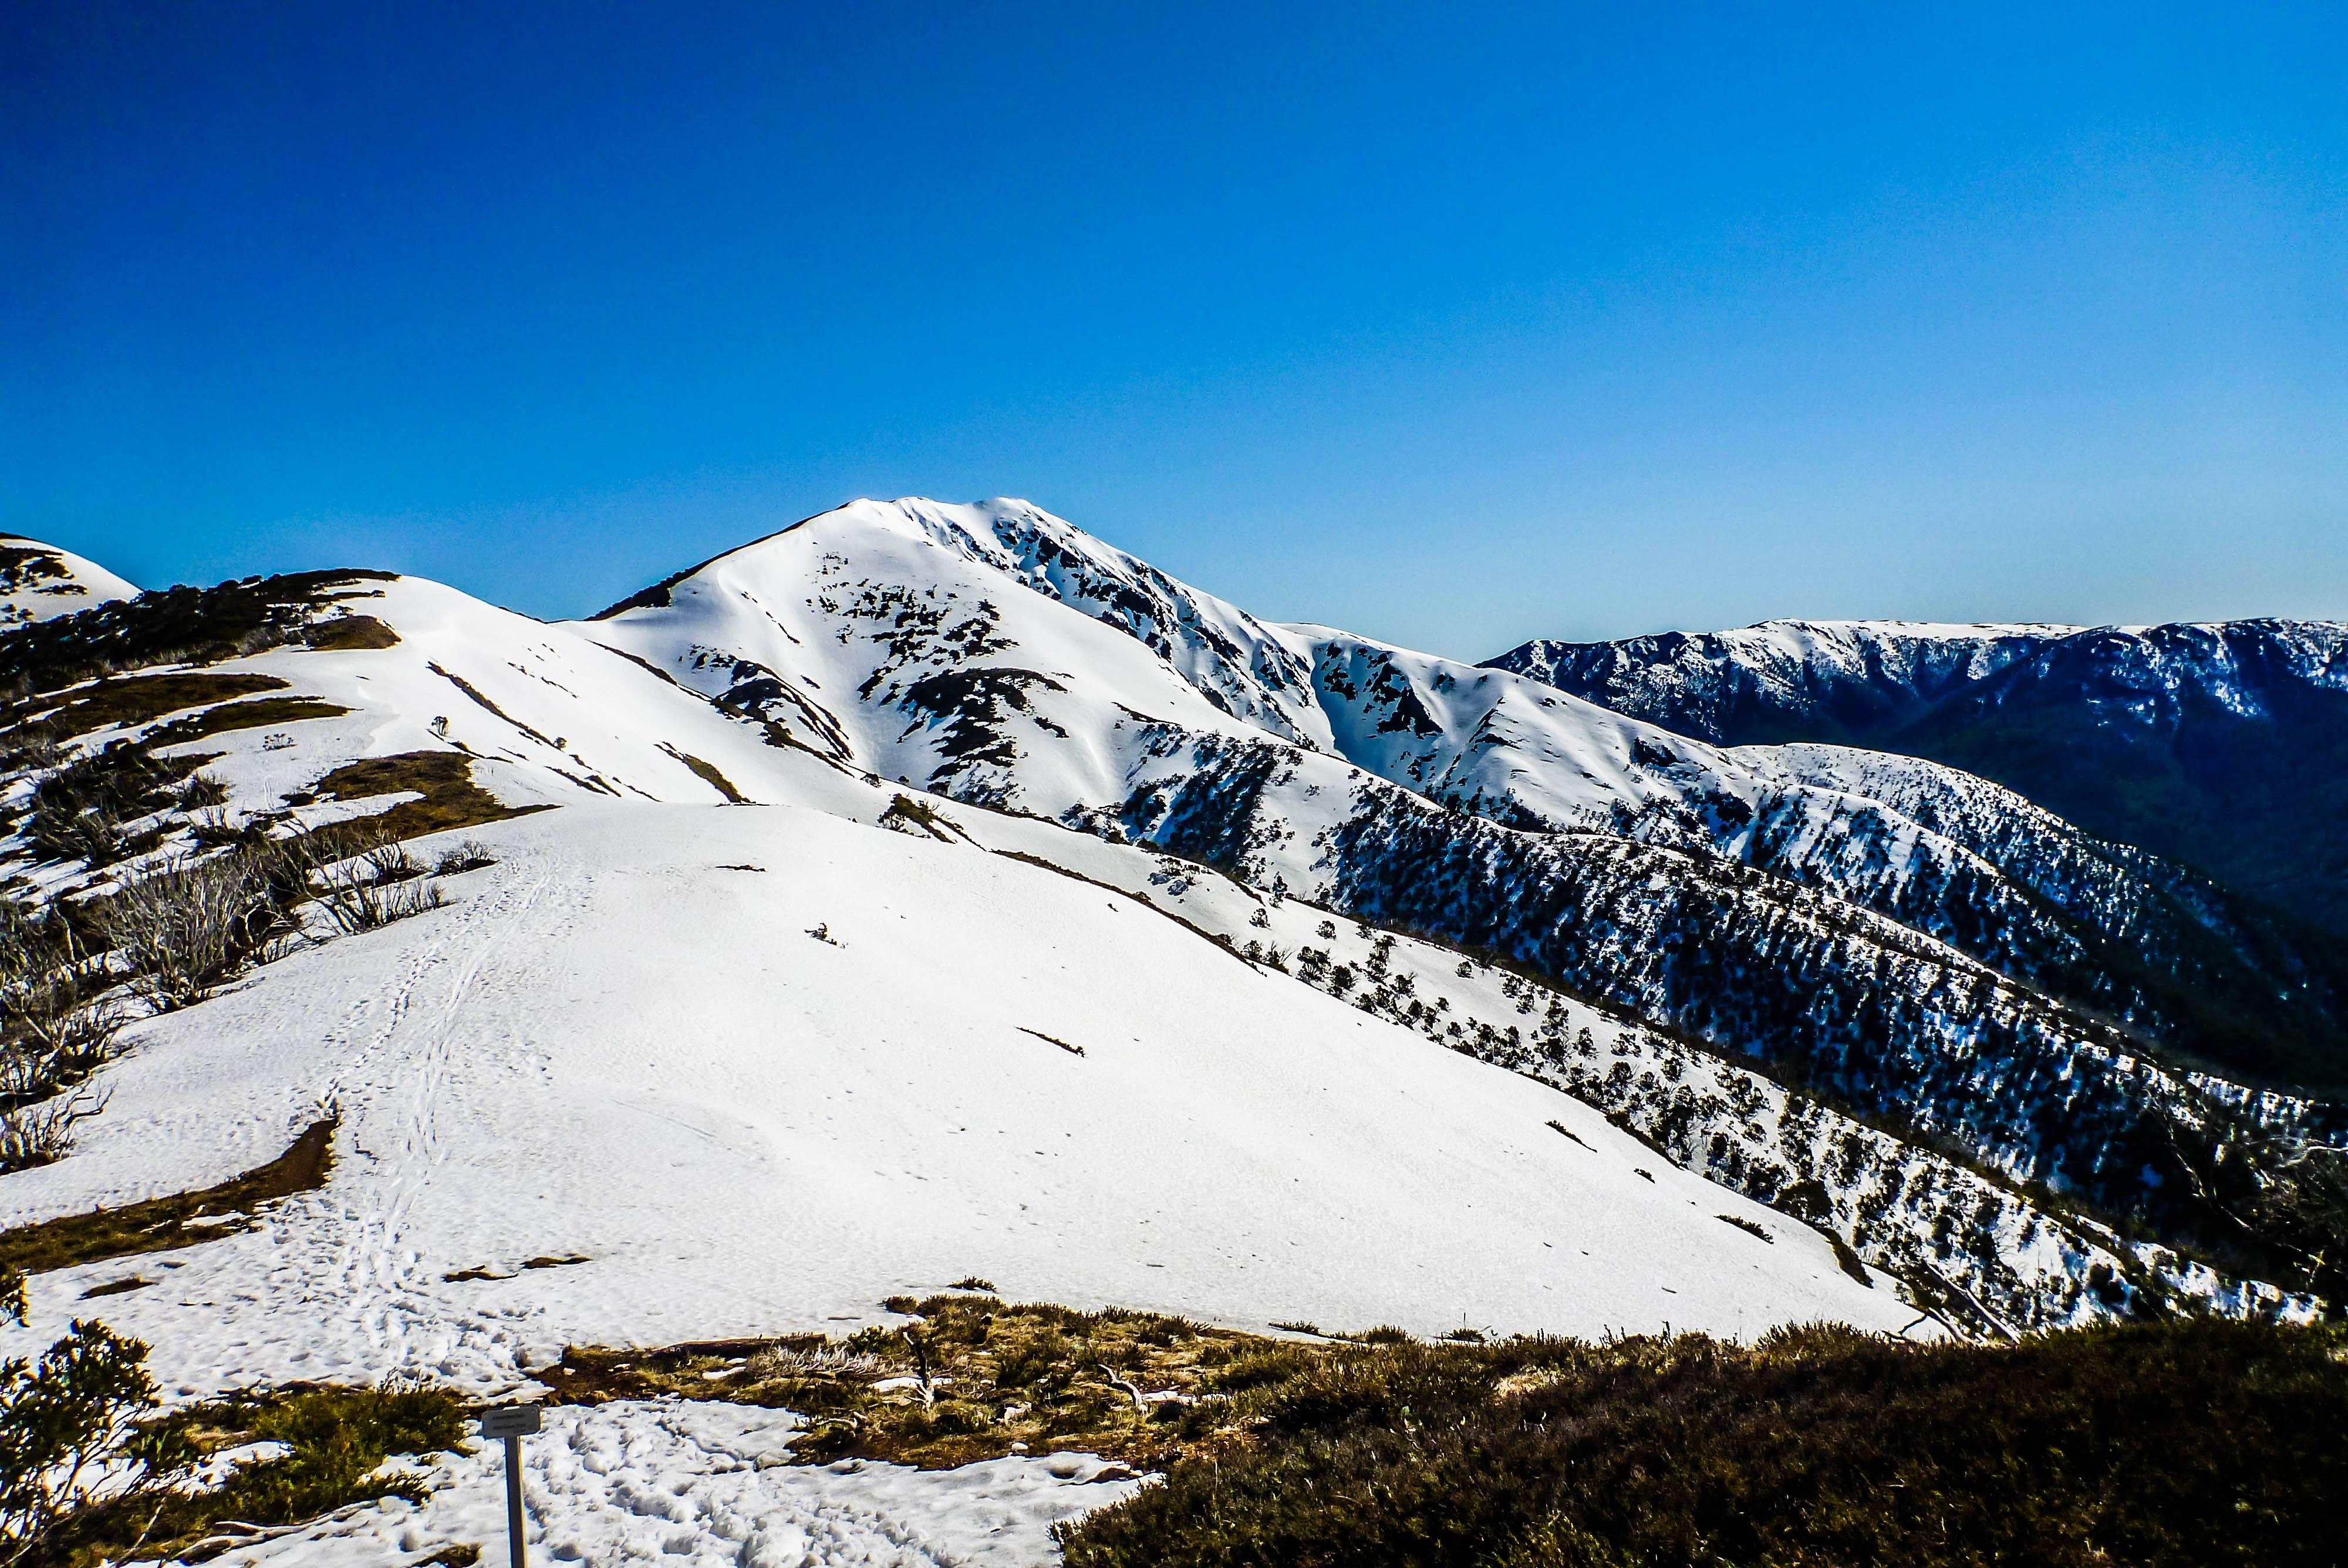 Vic Alps 2017-10-10 012.jpg